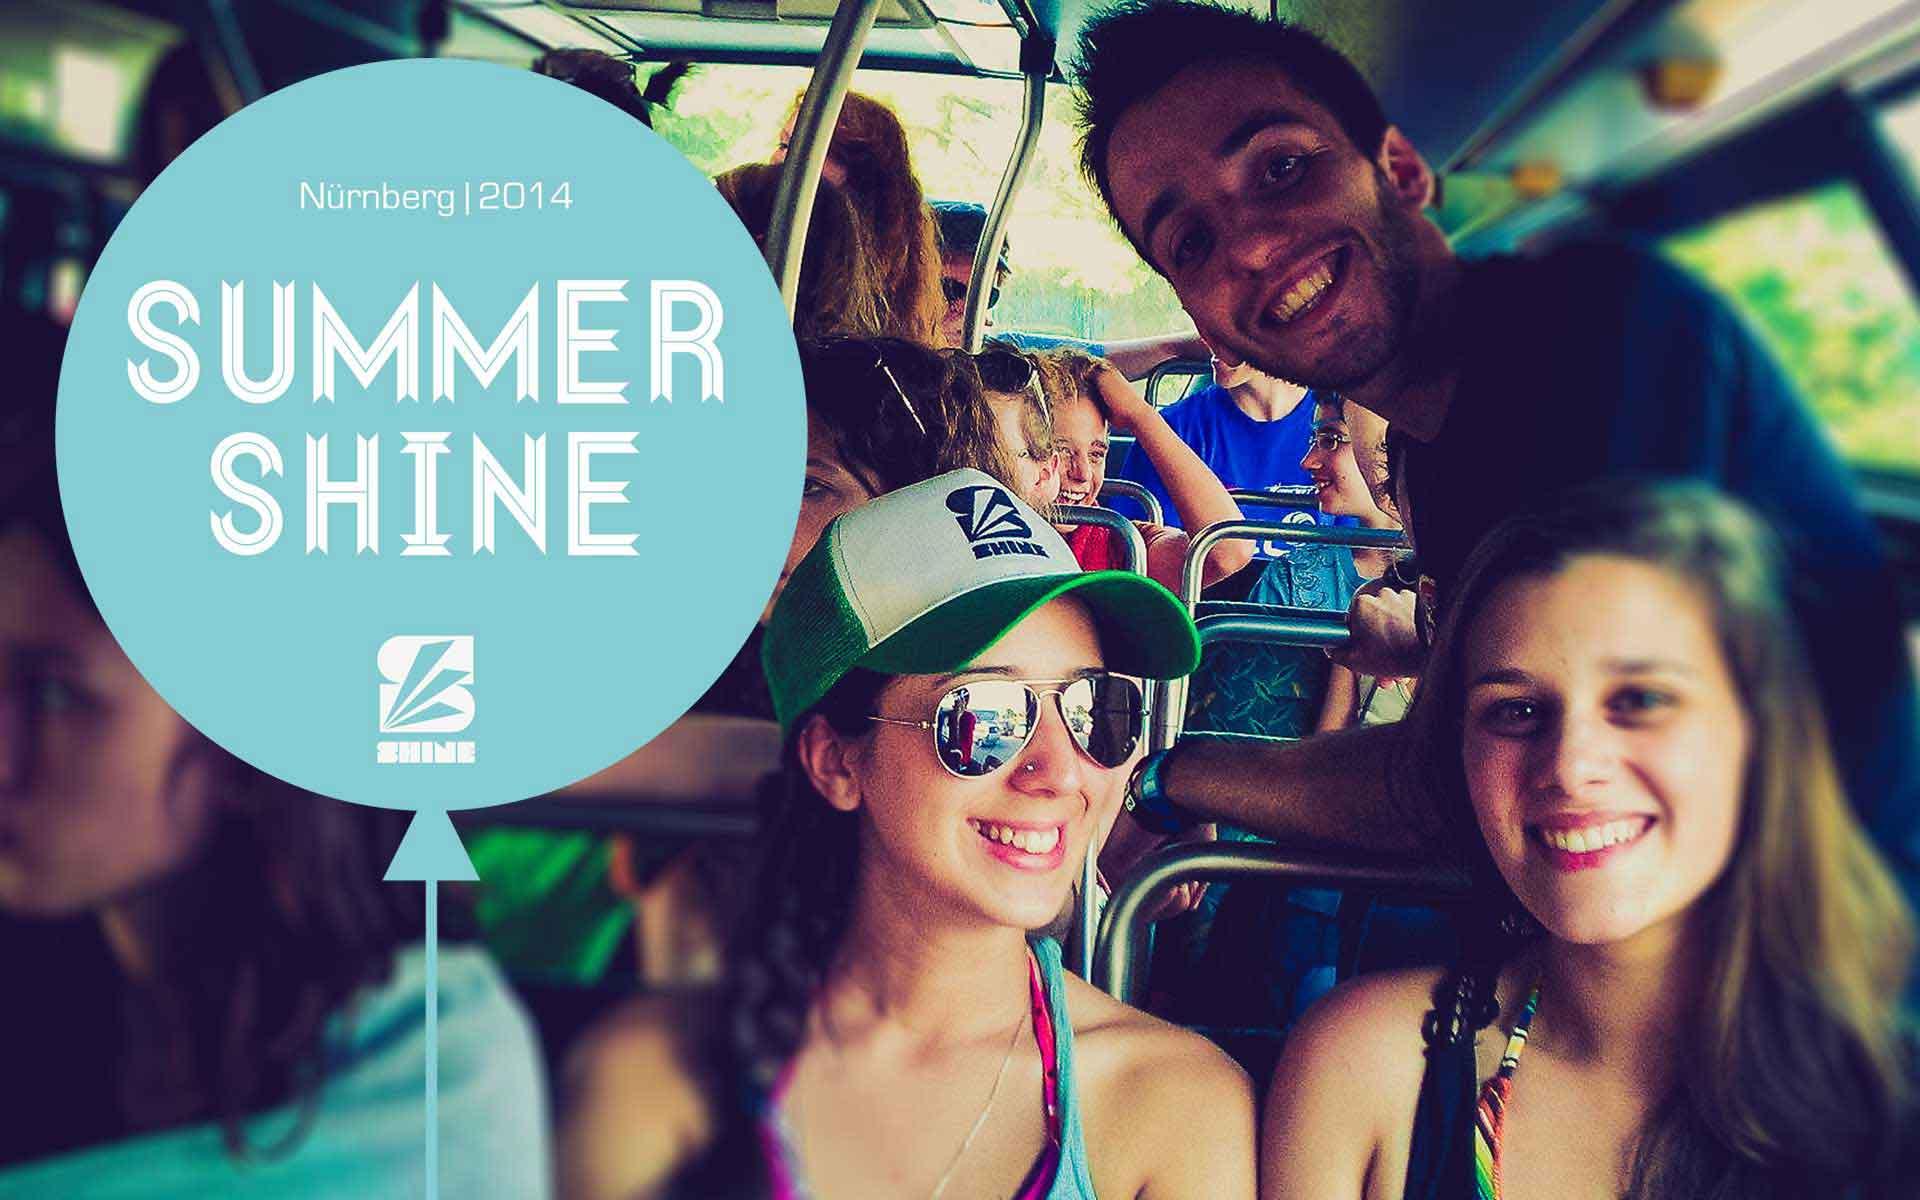 SummerSHINE'14